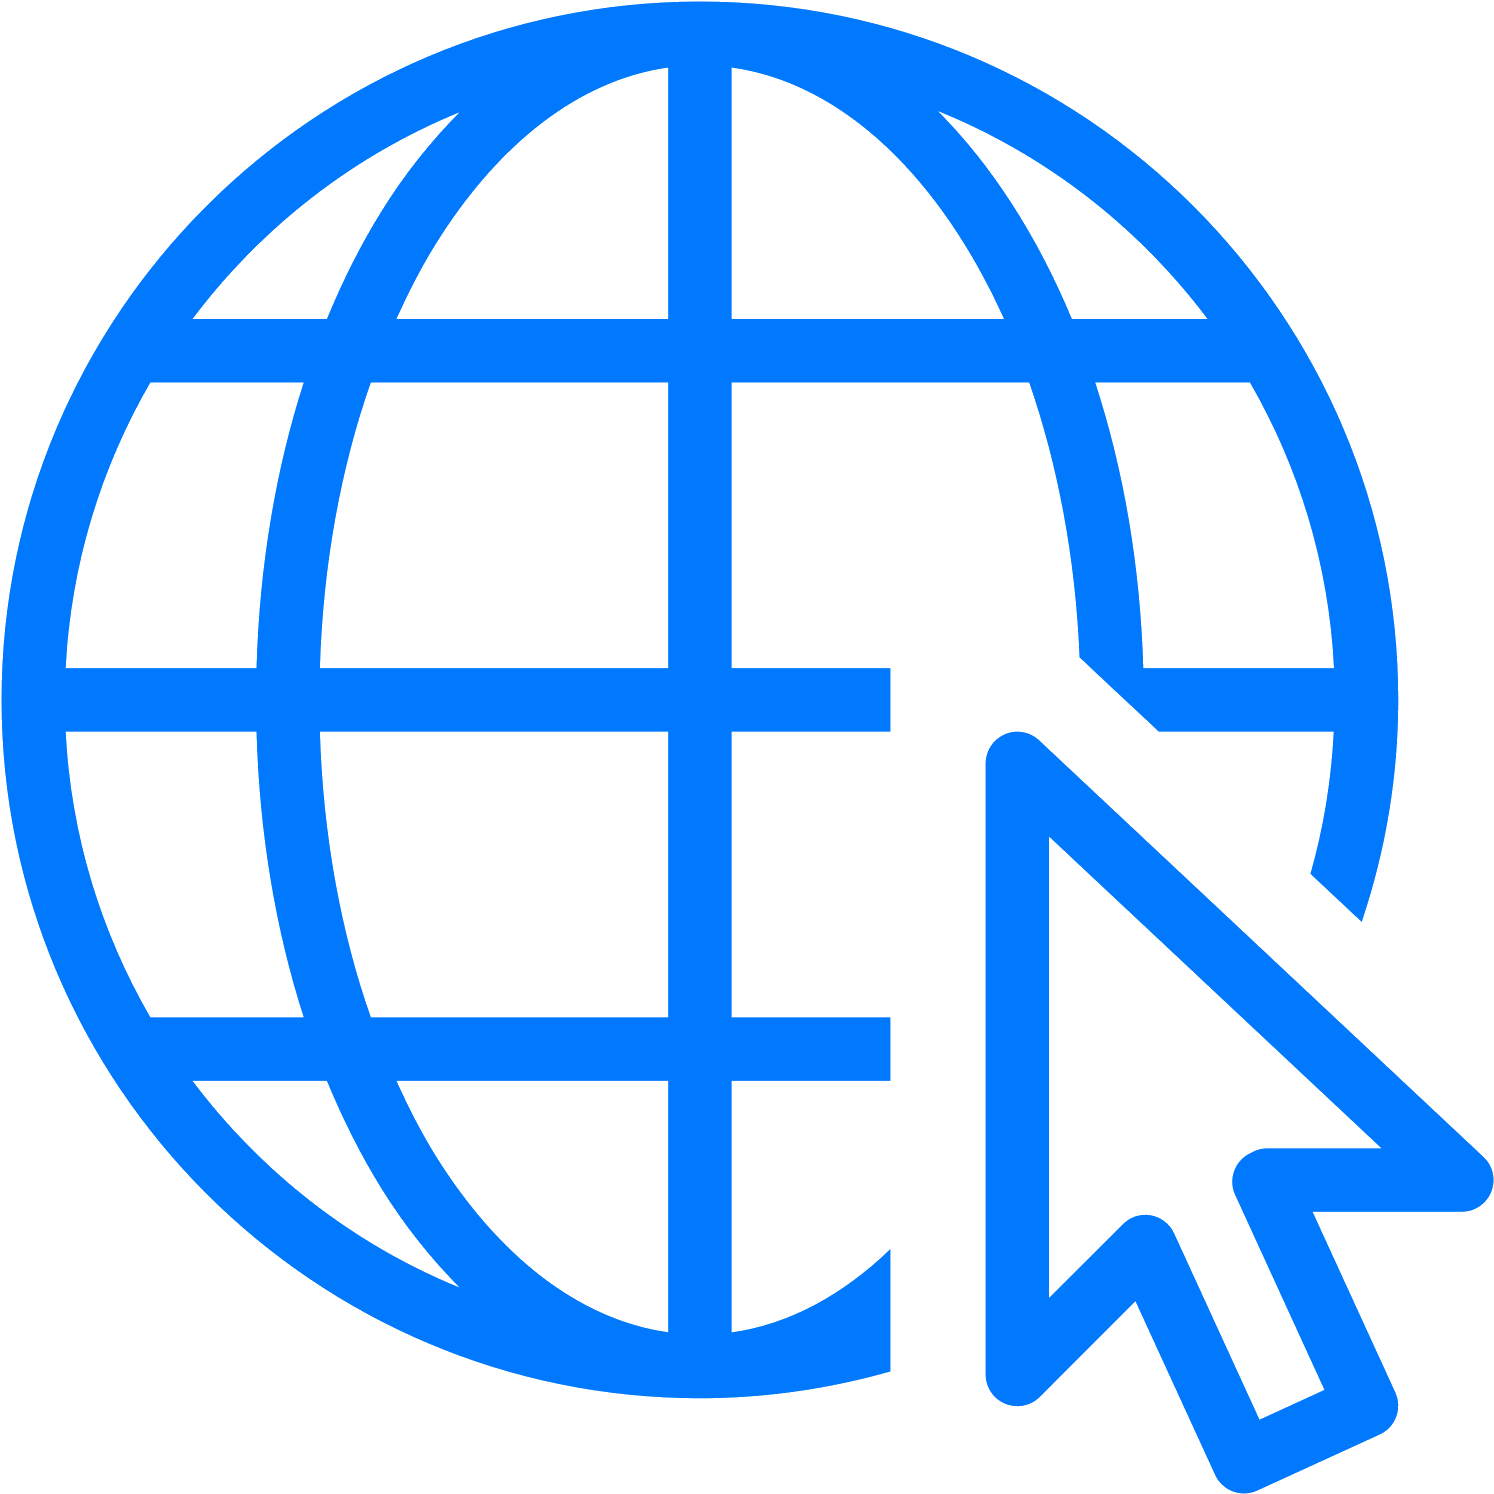 Computer Icons Symbol Art.